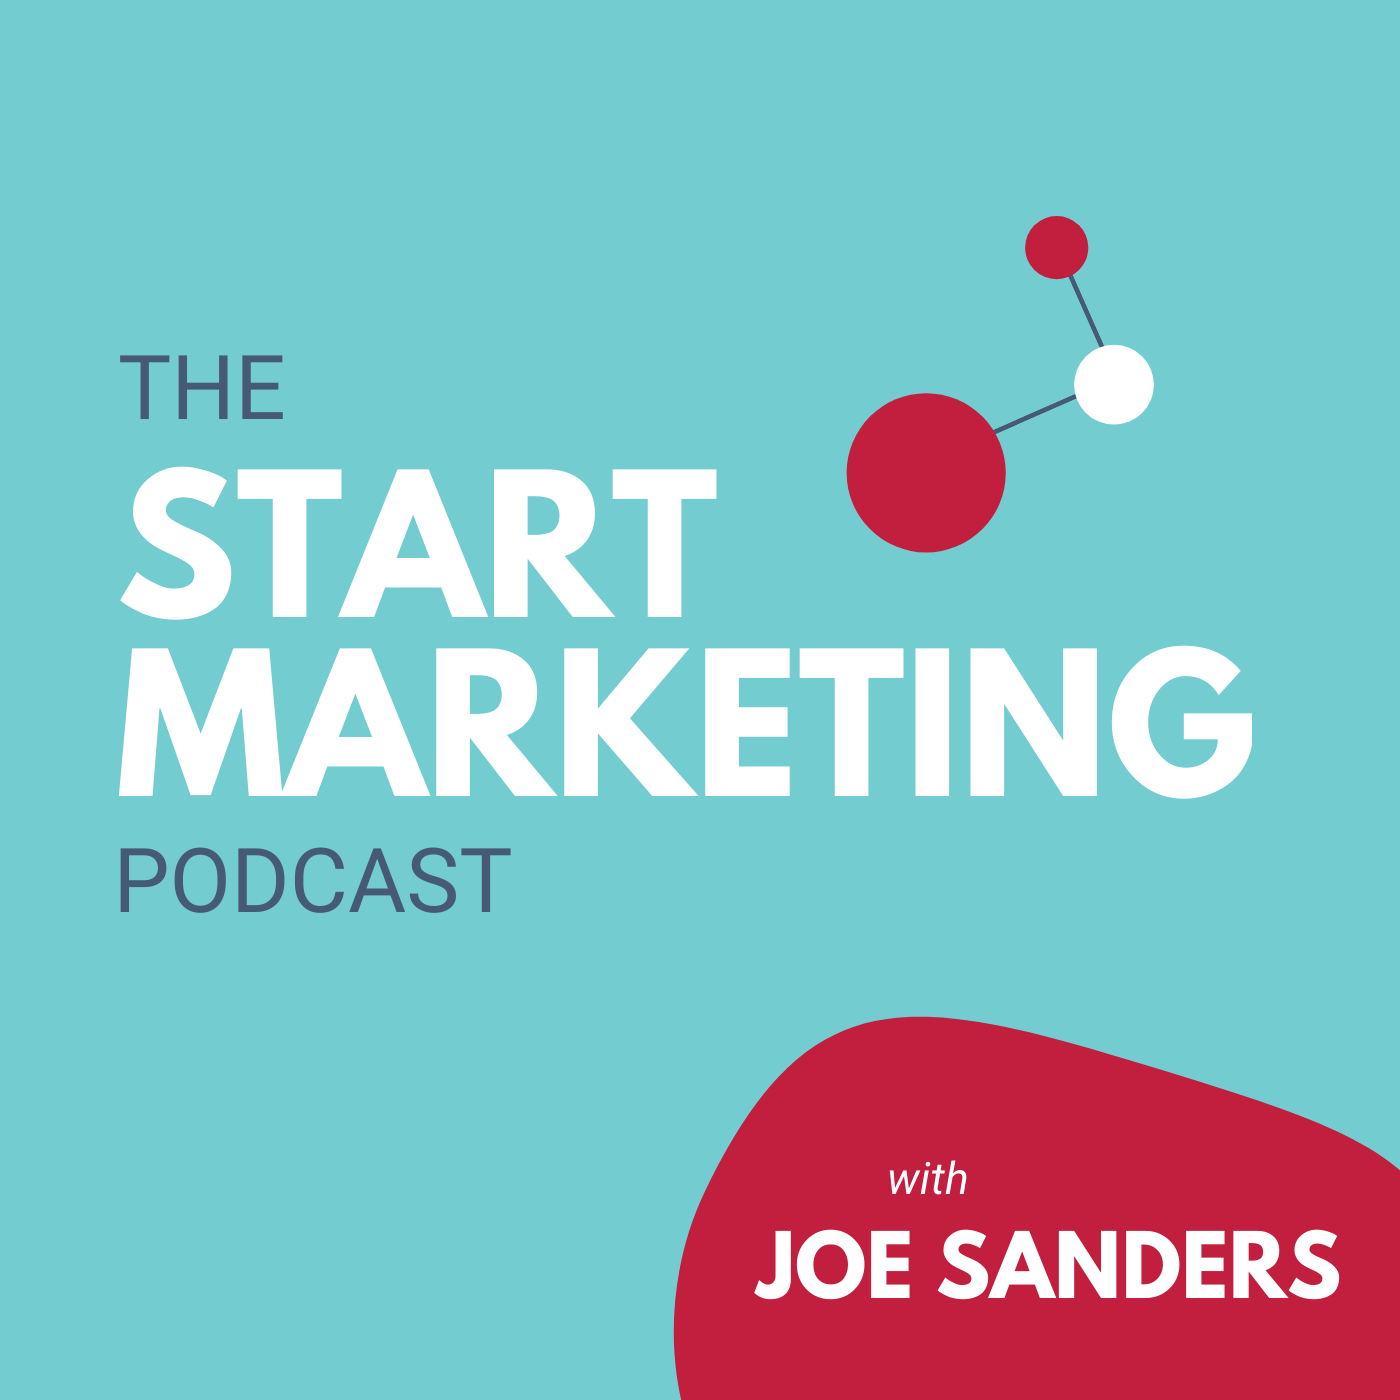 The Start Marketing Podcast